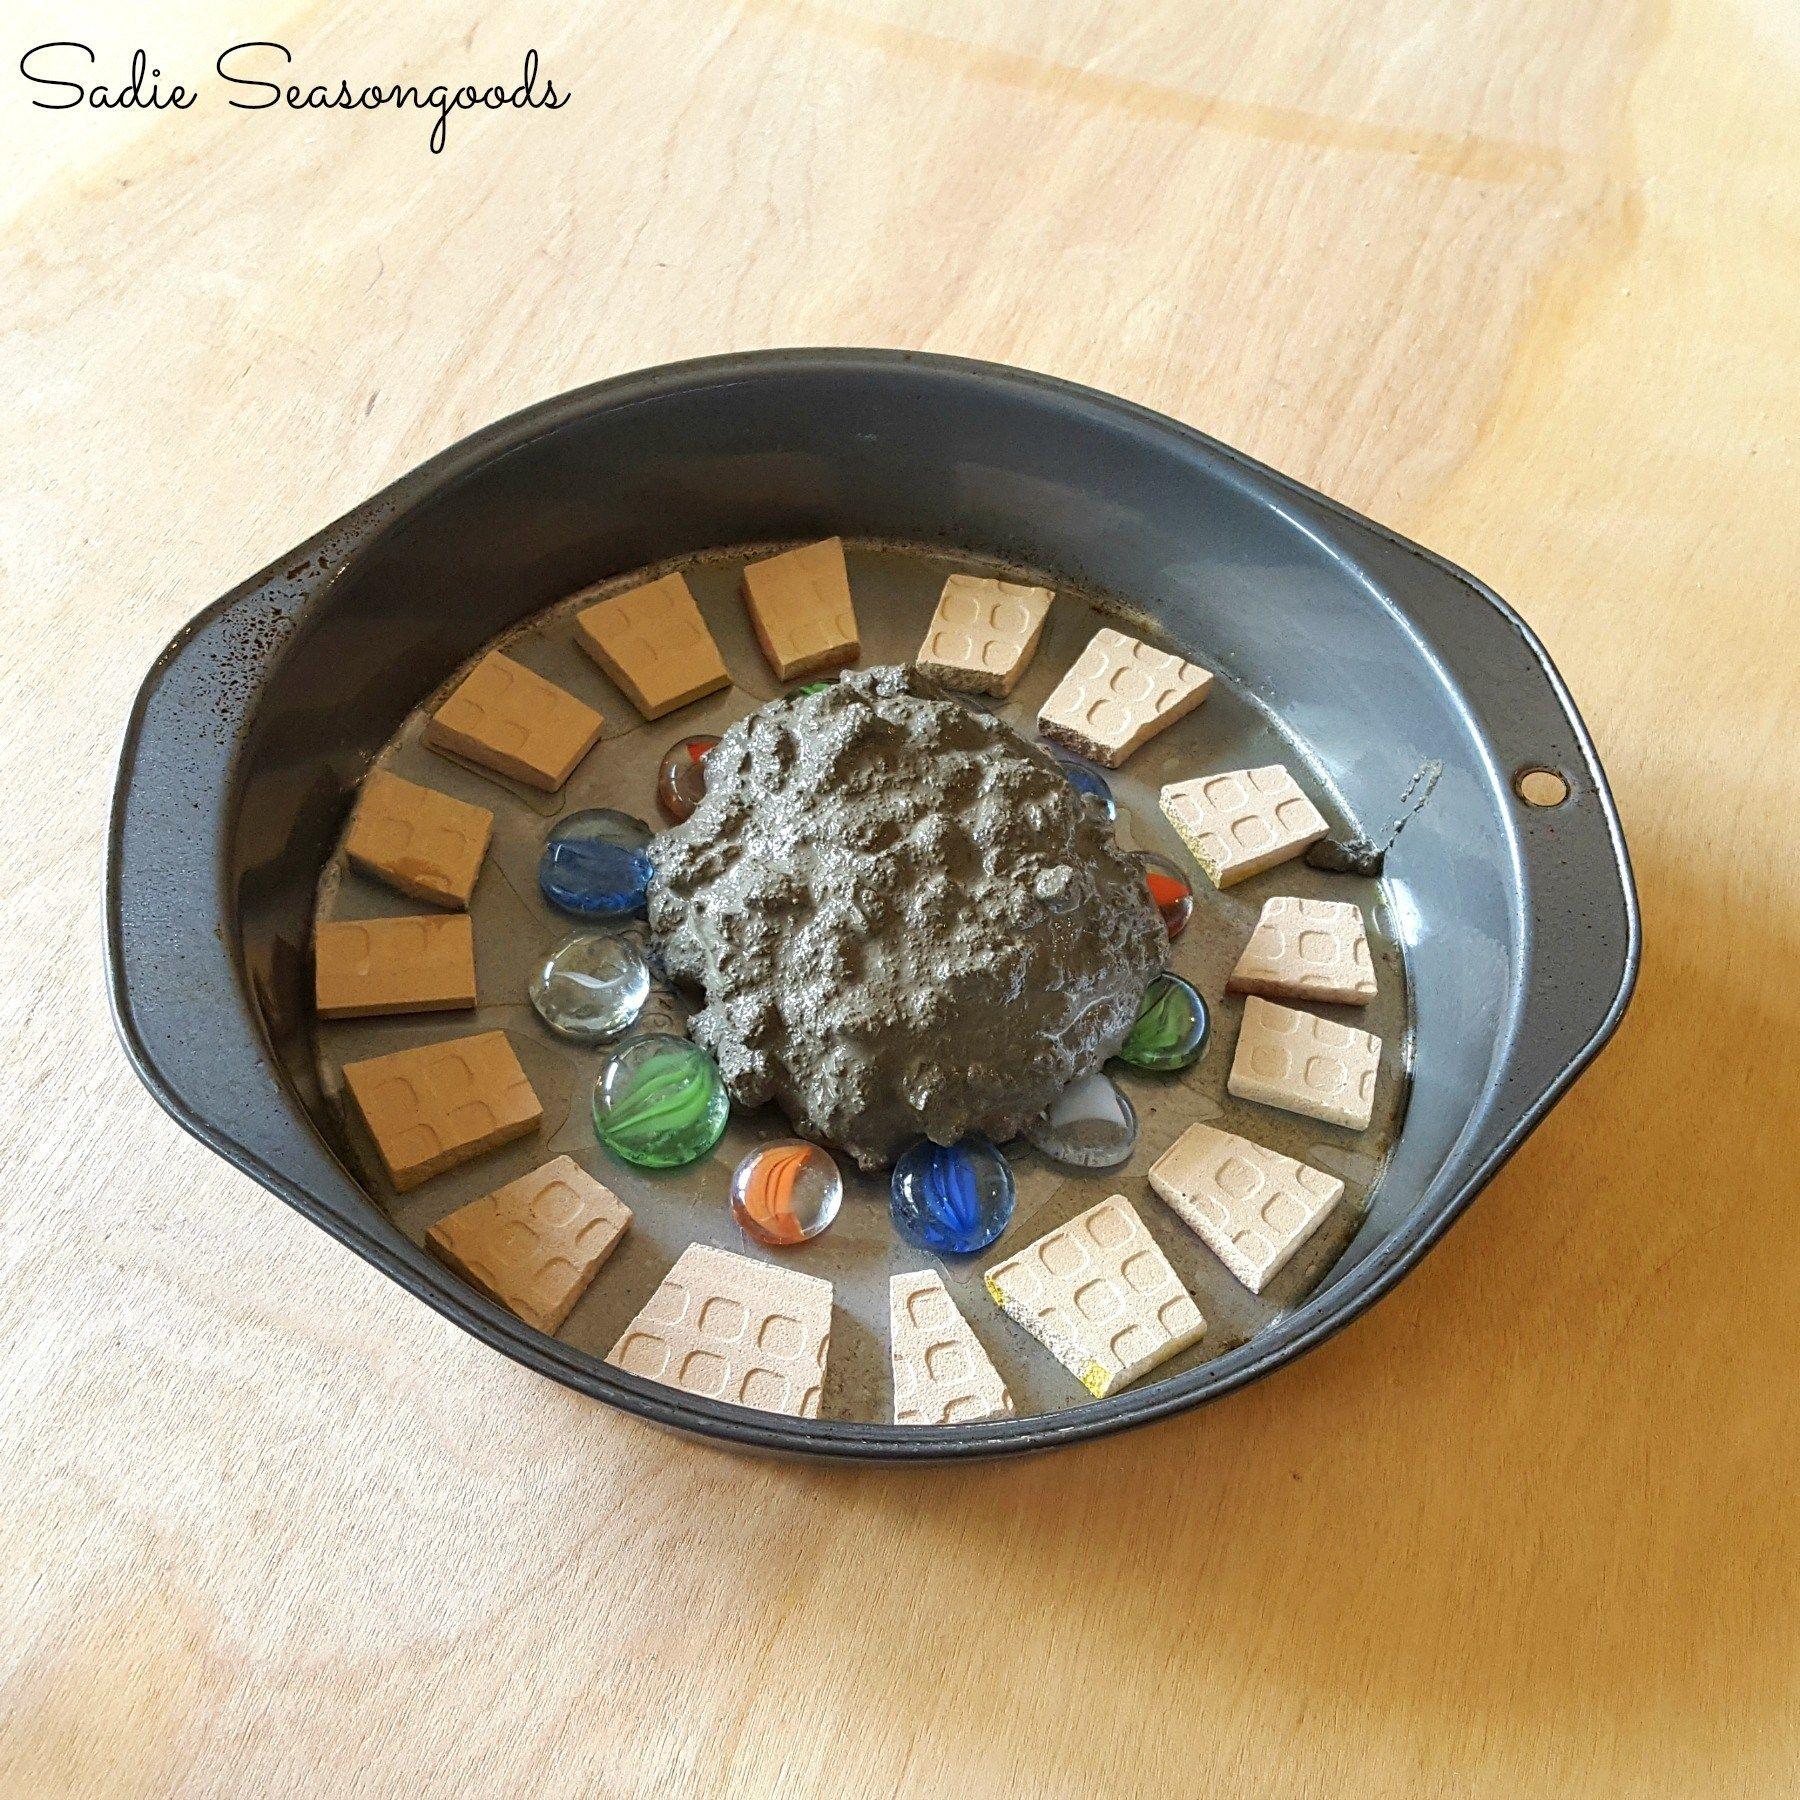 Diy Stepping Stones Repurposed Thrift Store Cake Pan For Diy Concrete Mosaic Stepping